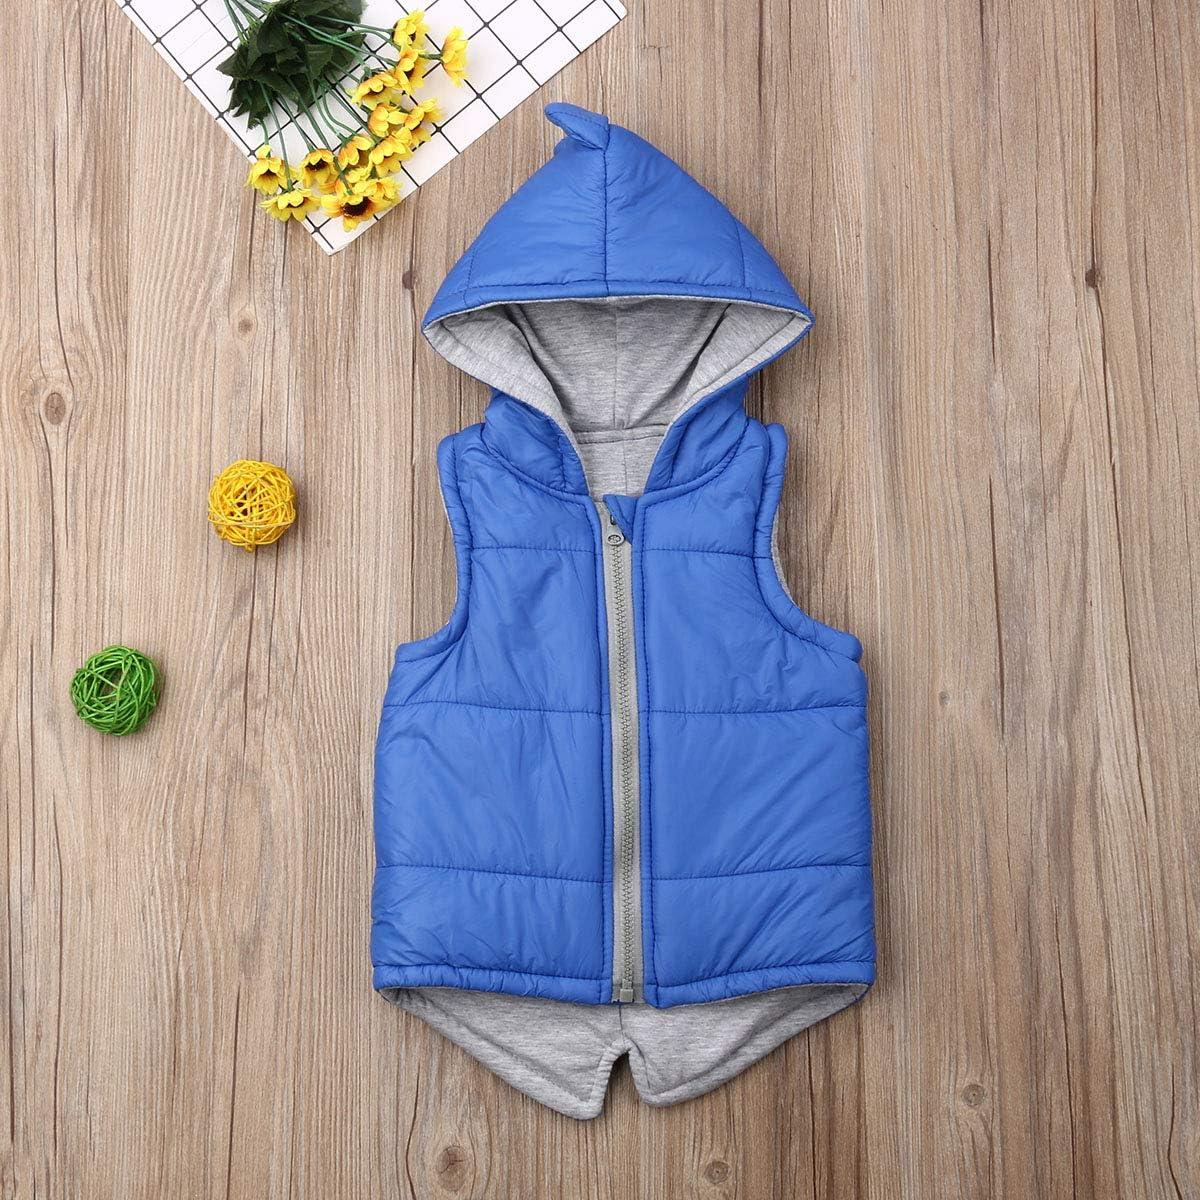 Toddler Baby Girl Boy Hoodies Vest Outwear 3D Dinosaur Sleeveless Waistcoat Warm Jacket Fall Winter Clothes